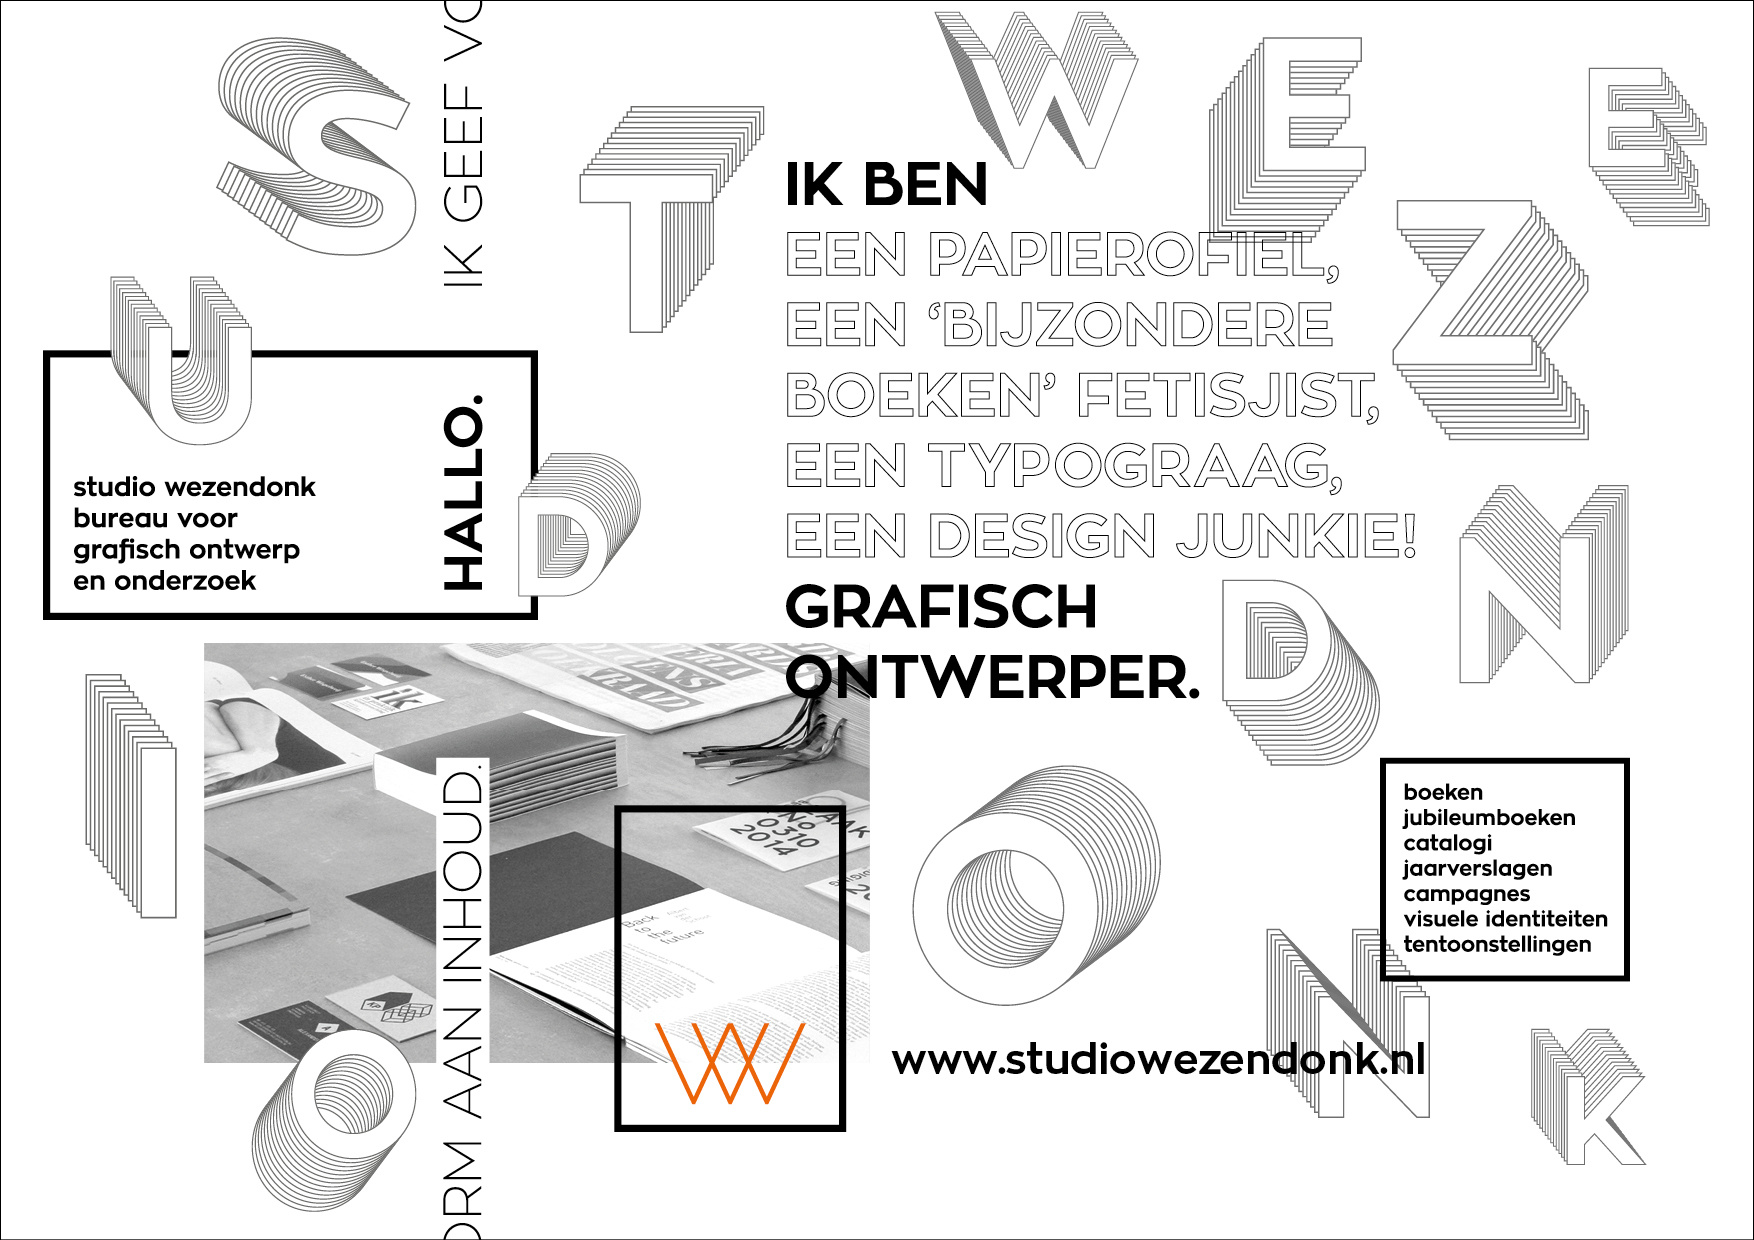 Studio Wezendonk